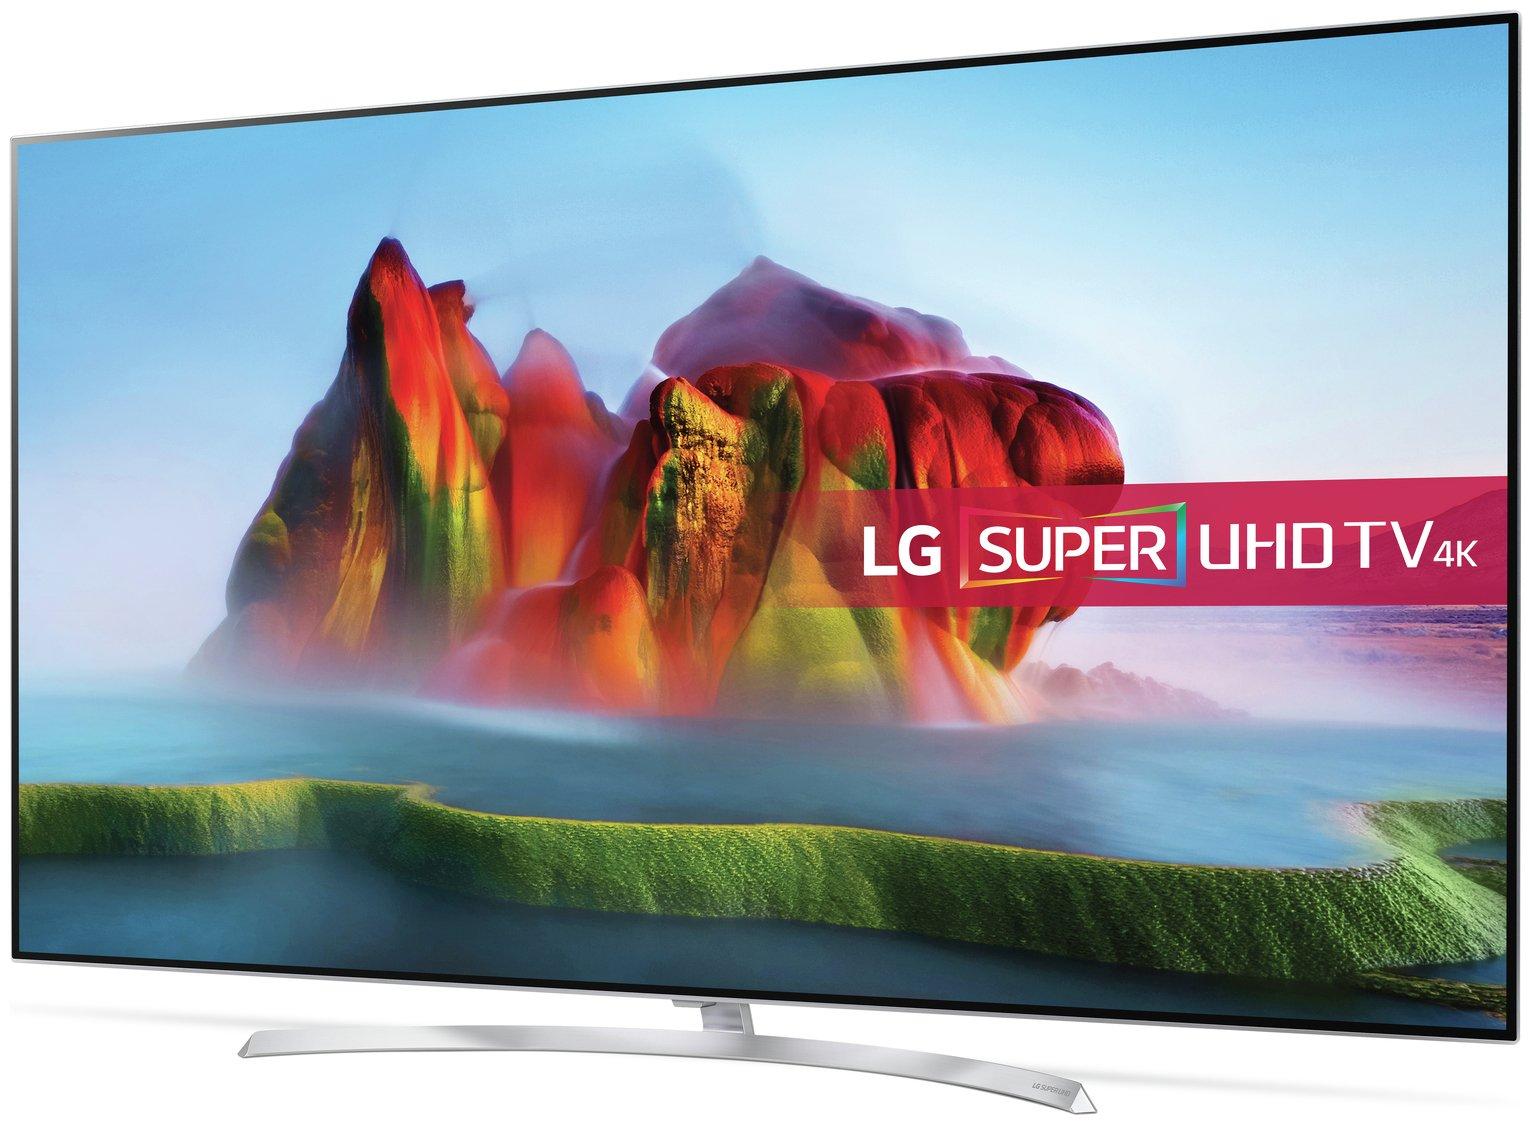 LG LG 55SJ950V 55 Inch Smart 4K Ultra HD TV with HDR